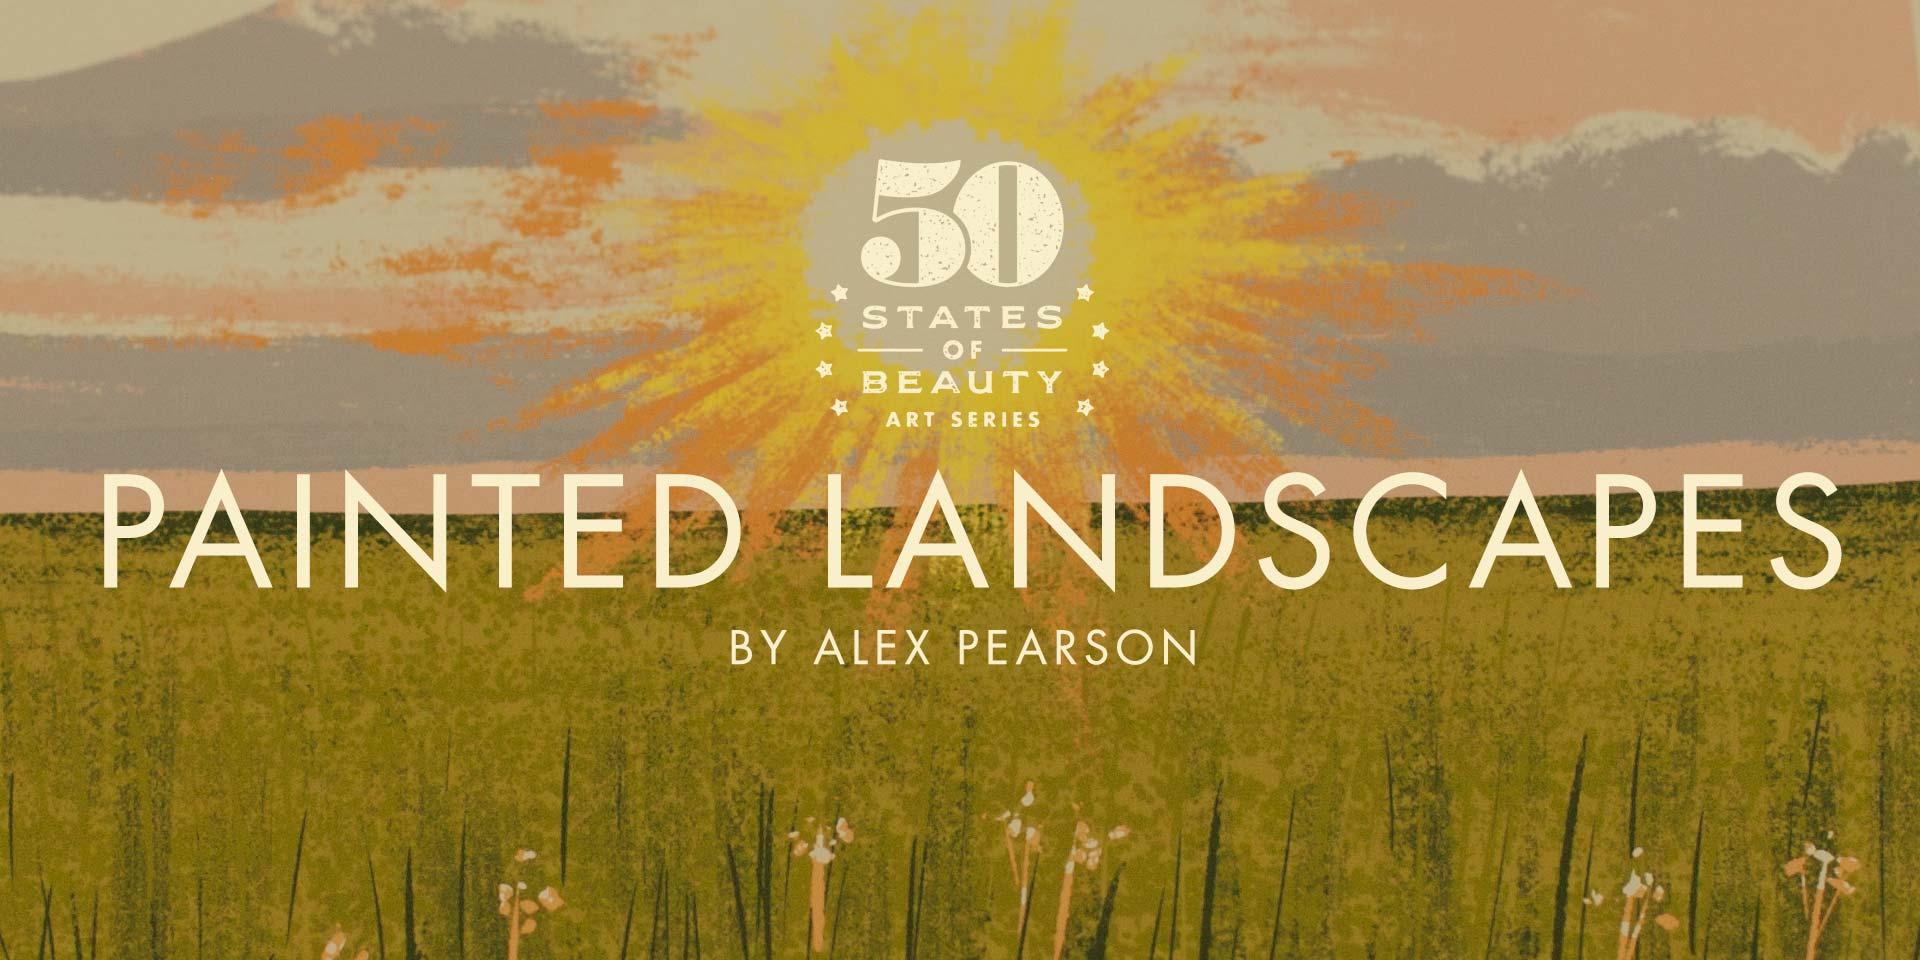 painted-landscapes-Slideshow-illinois.jpg